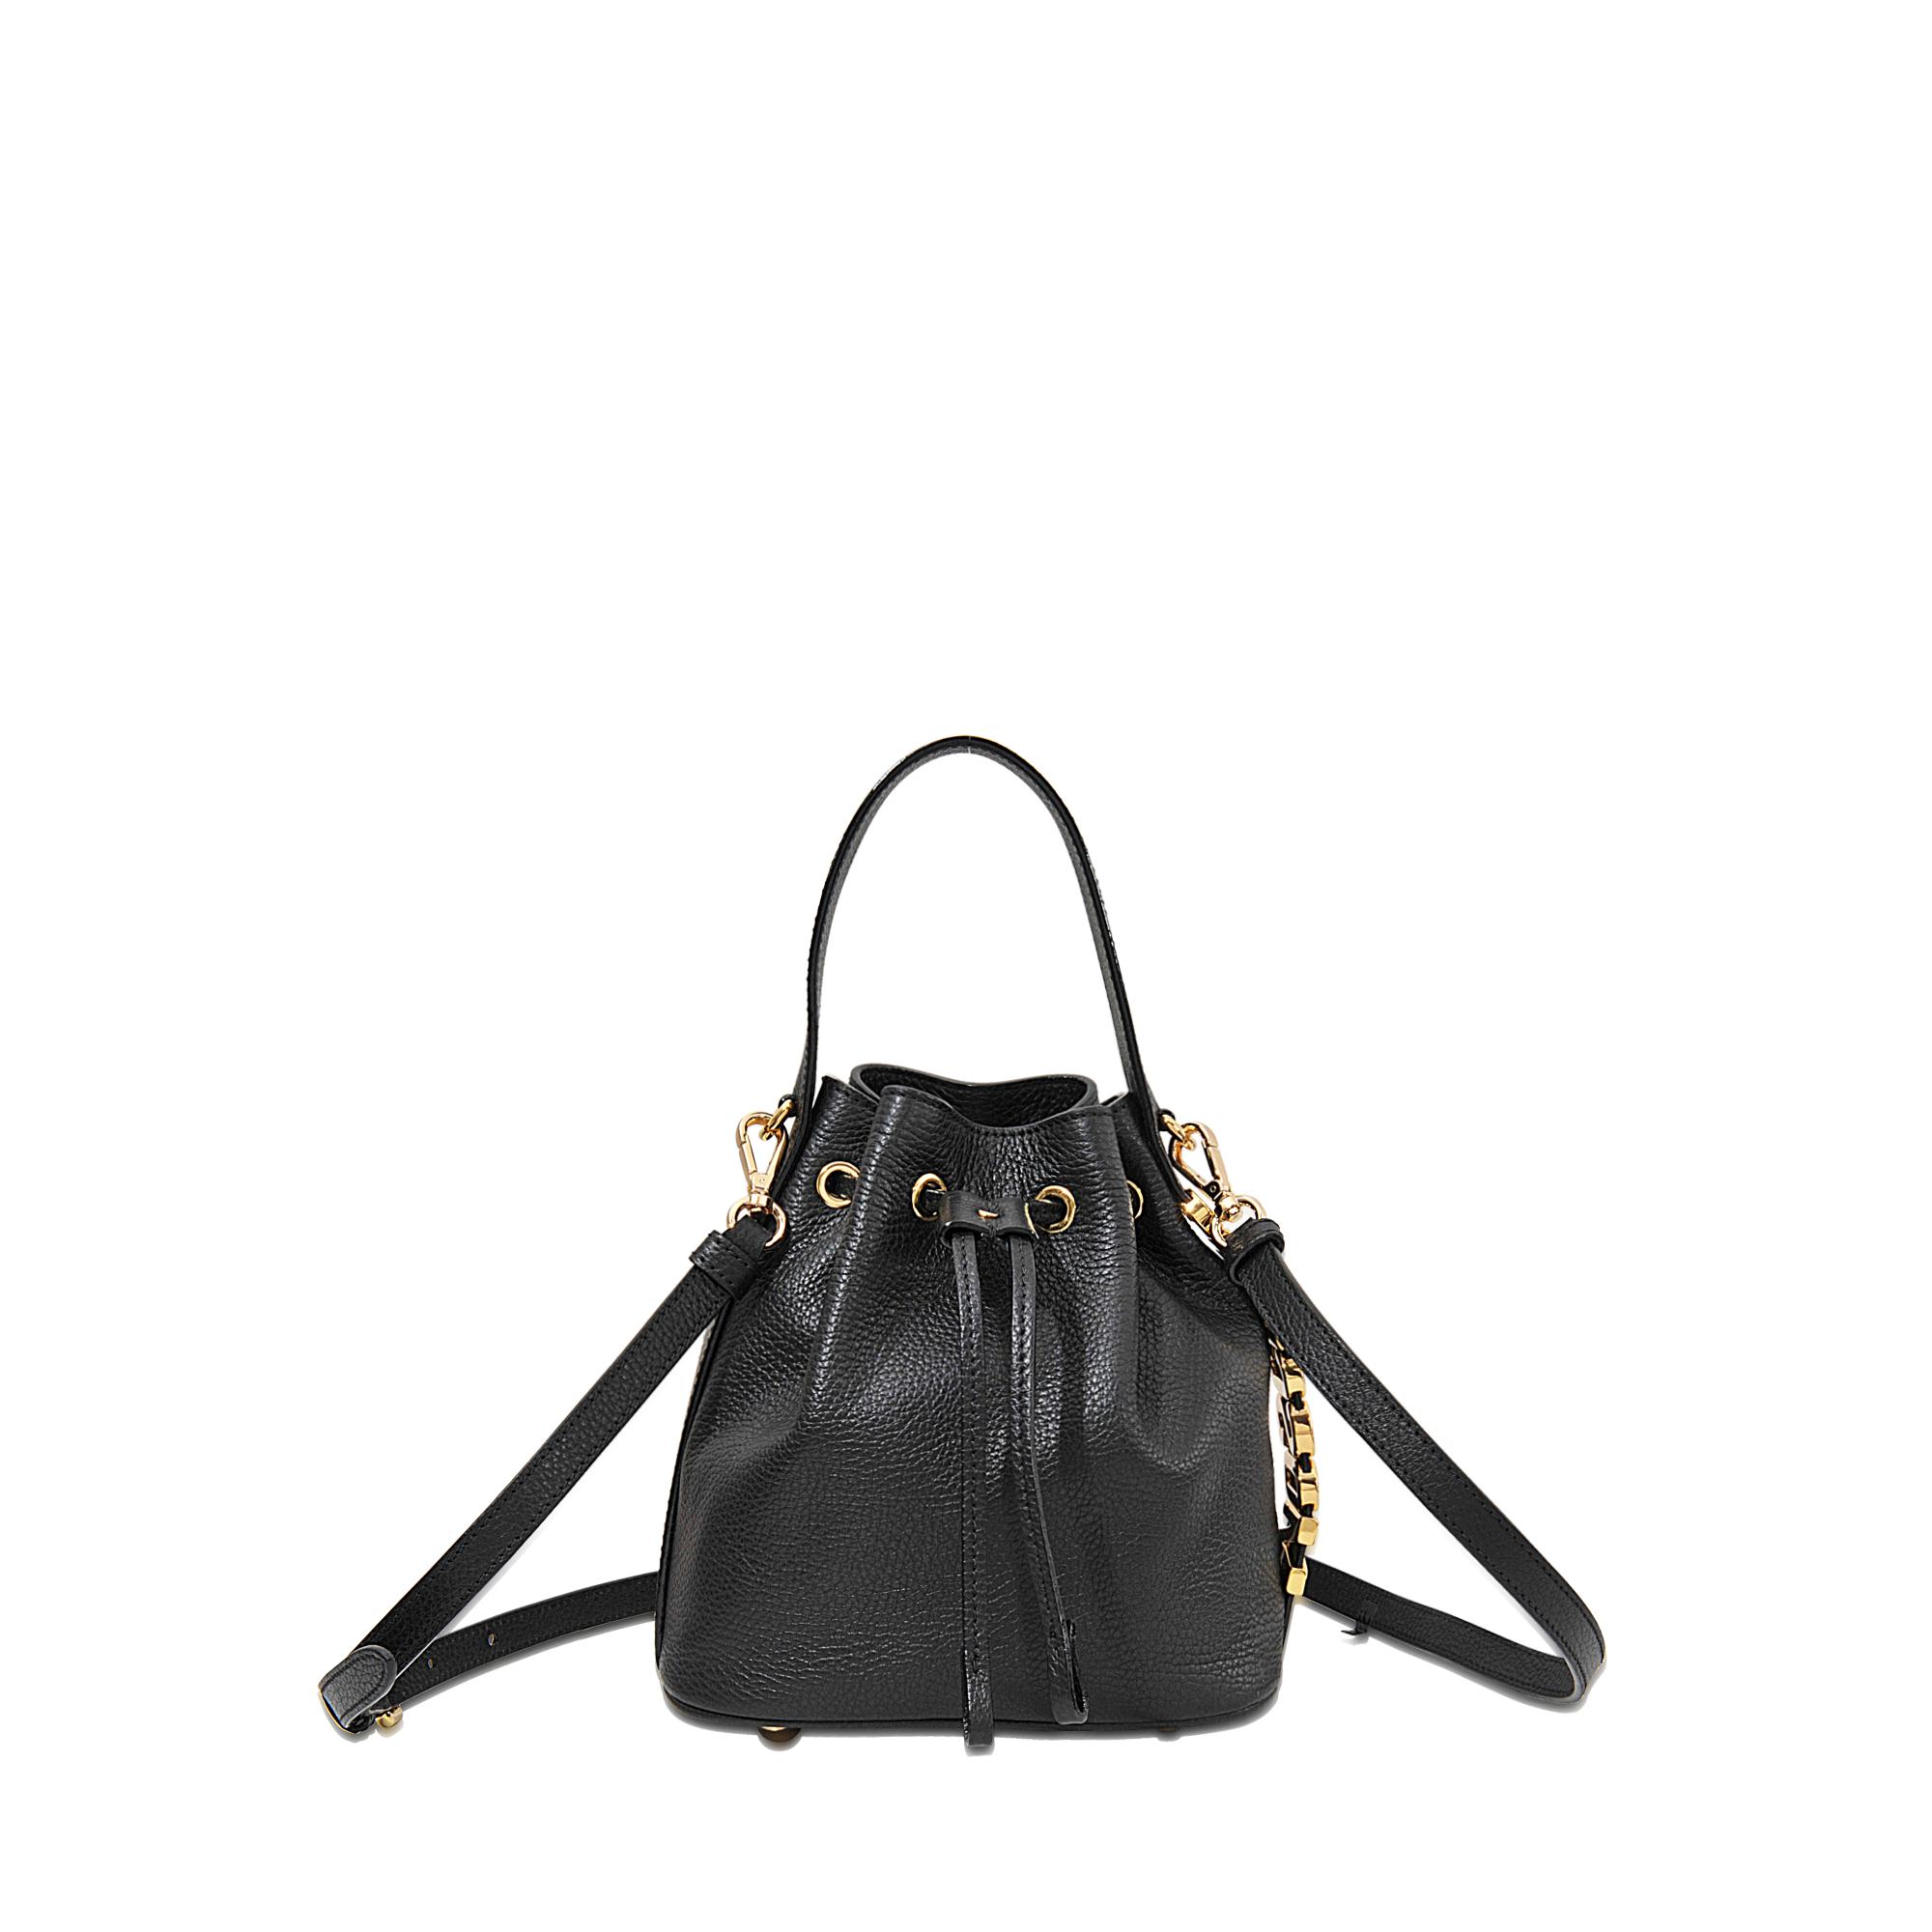 2fa79a18a32 Moschino Mini Lettering Bucket Bag in Black - Lyst